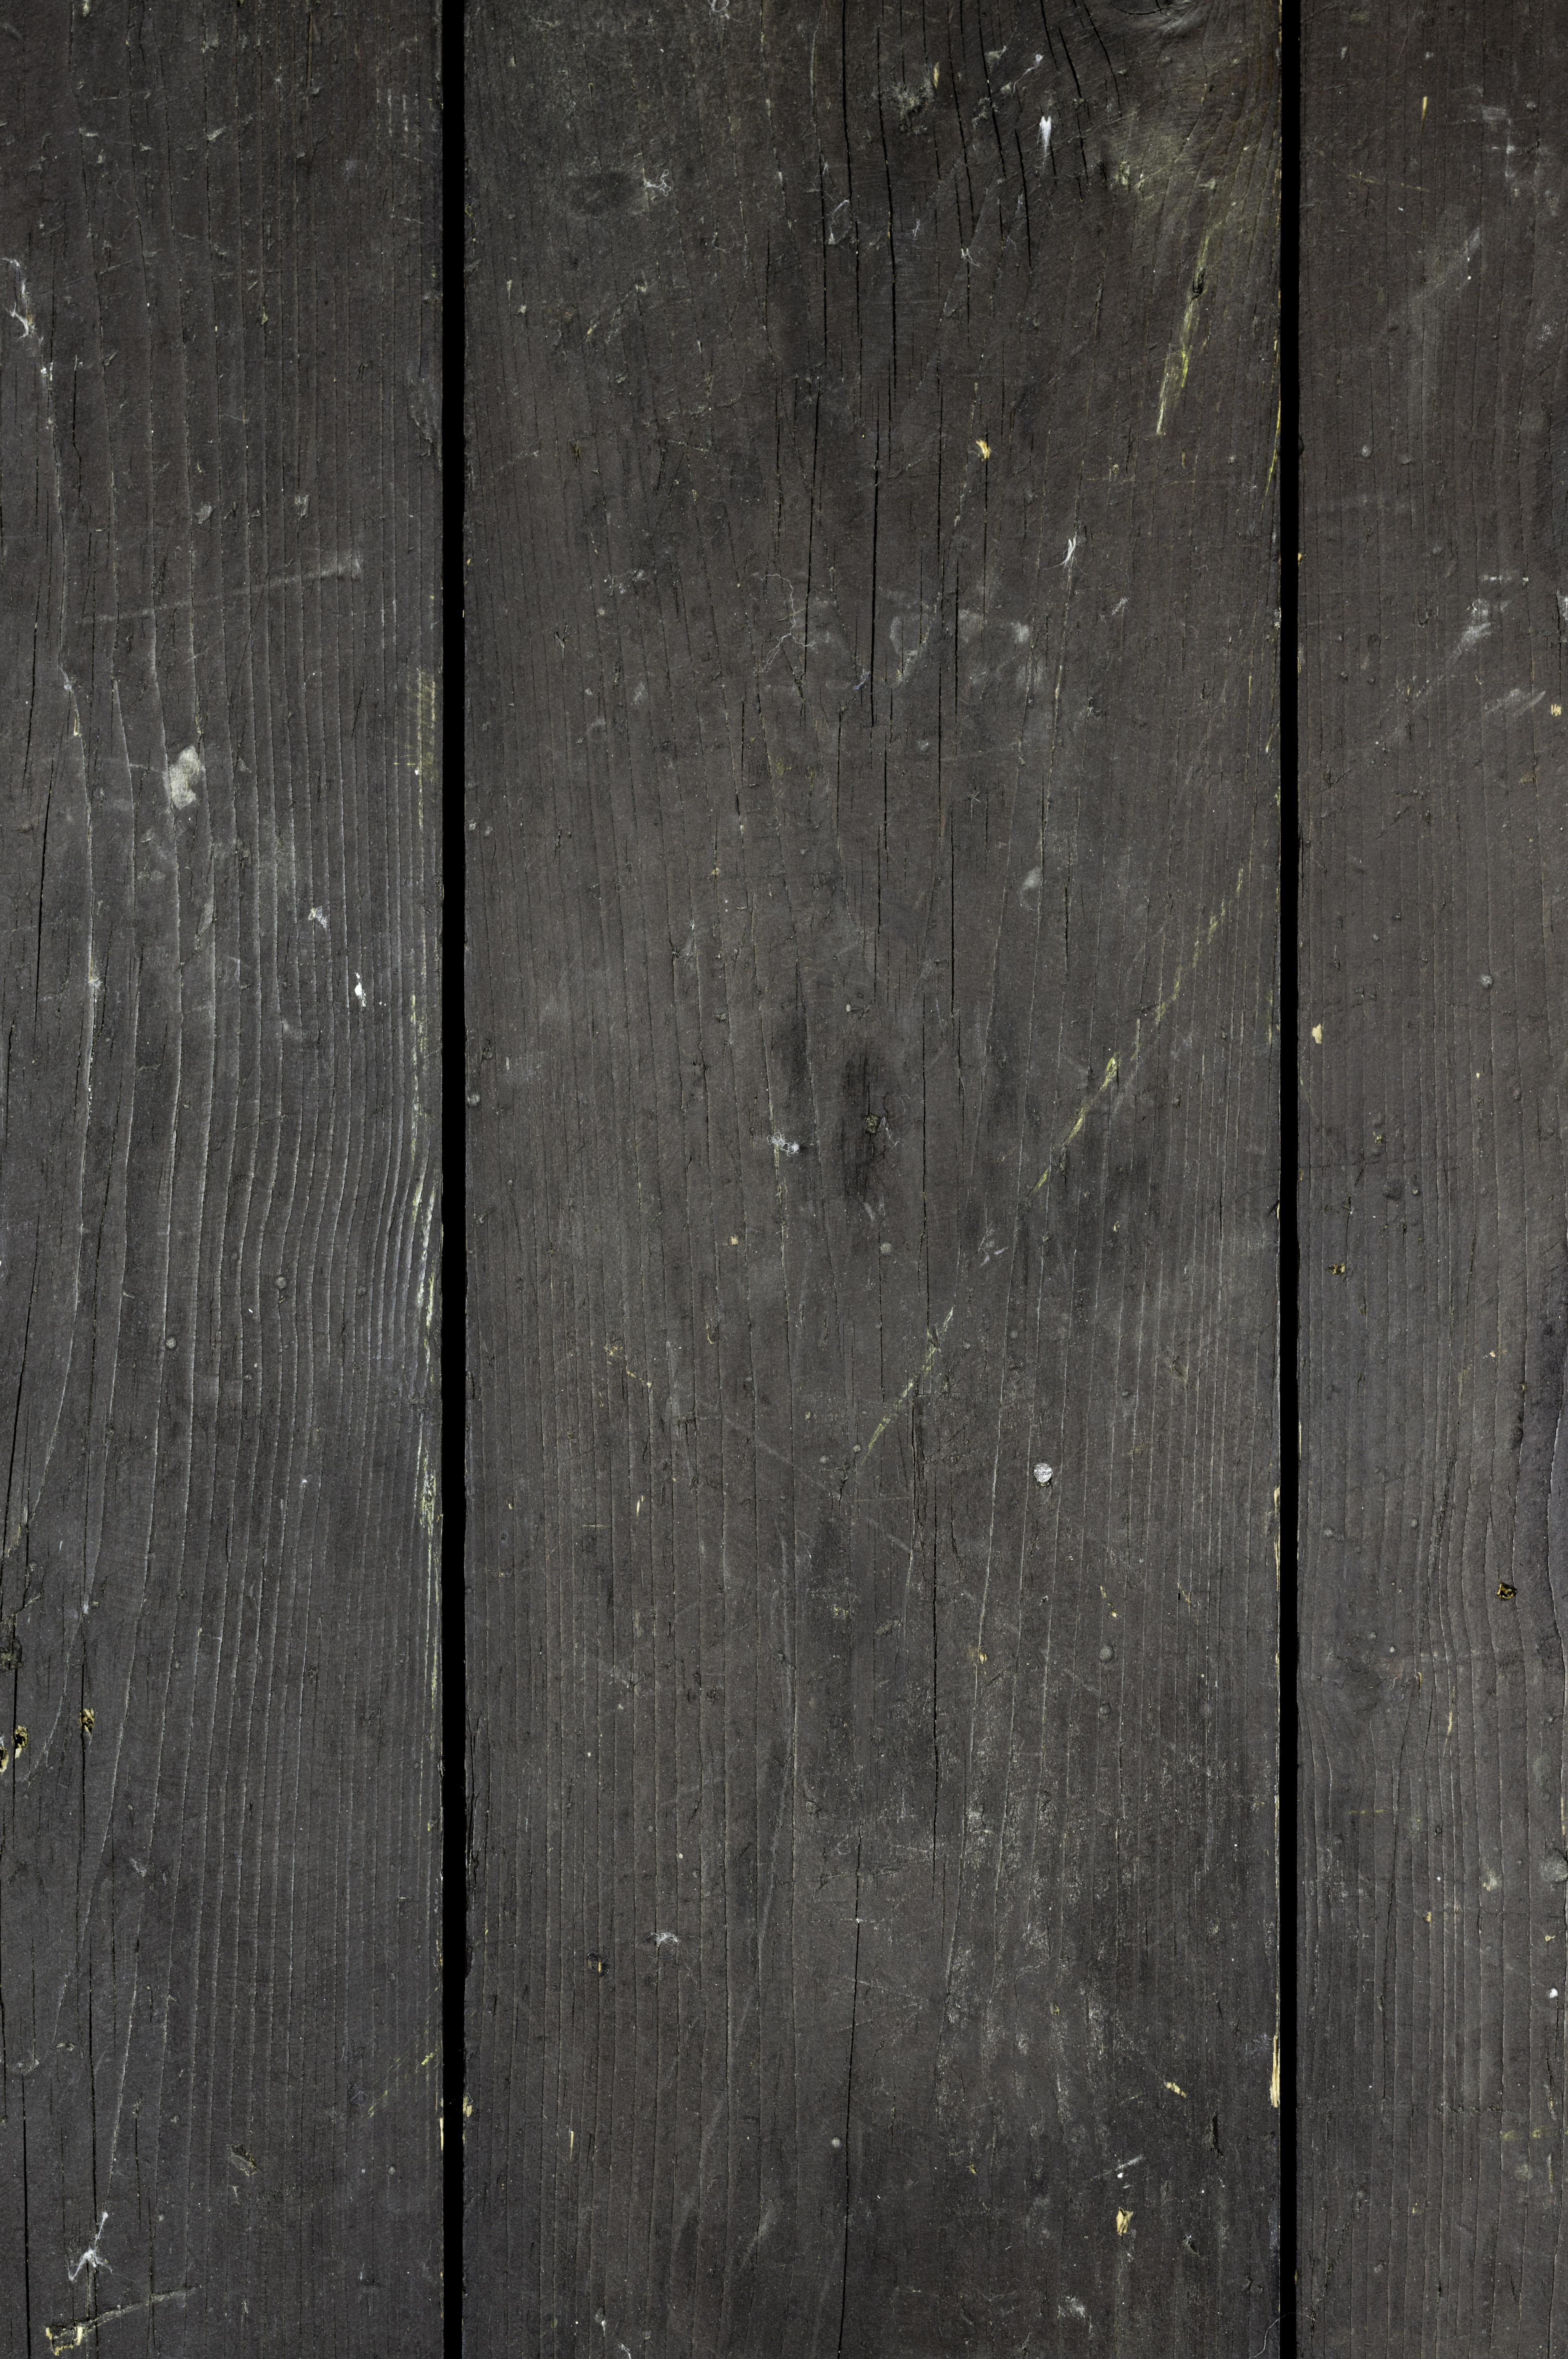 Board Wood Texture Plank Floor Old Wall Dark Line Tile Black Monochrome Hardwood Wooden Flooring